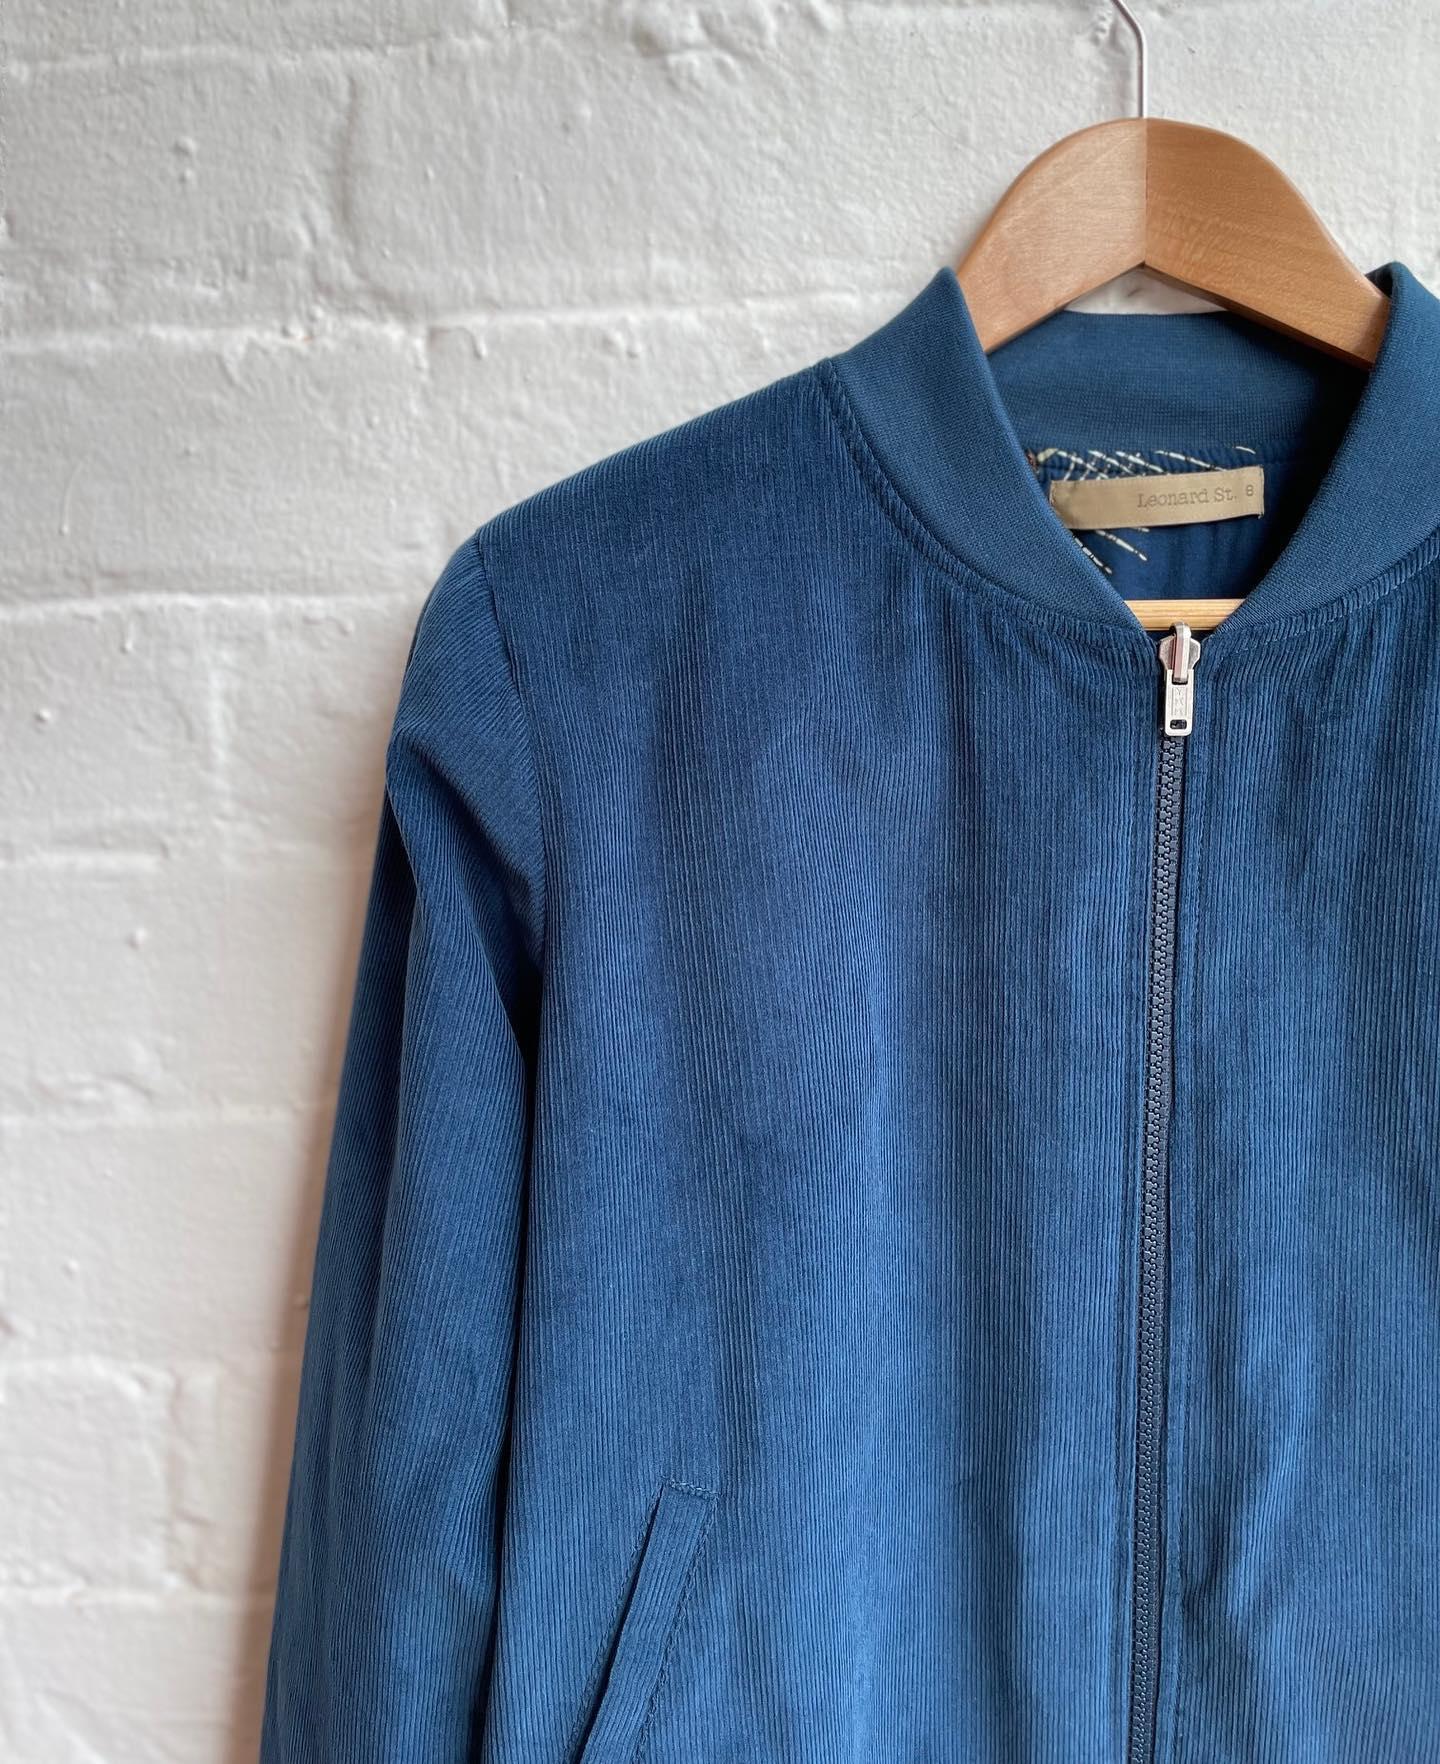 Wren Cord Bomber jacket